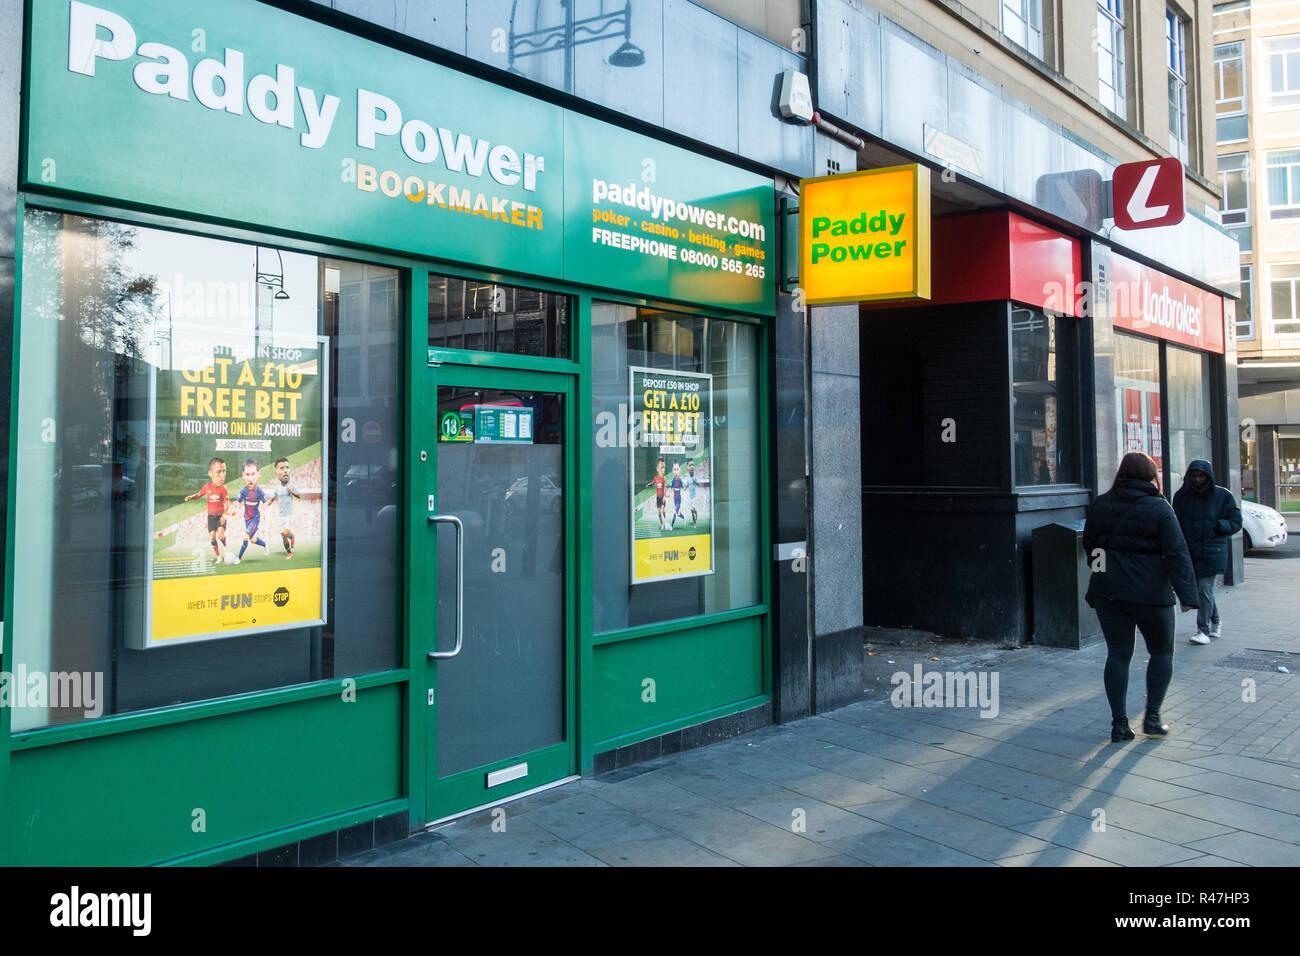 Bradford west election betting website redskins vs cowboys betting line